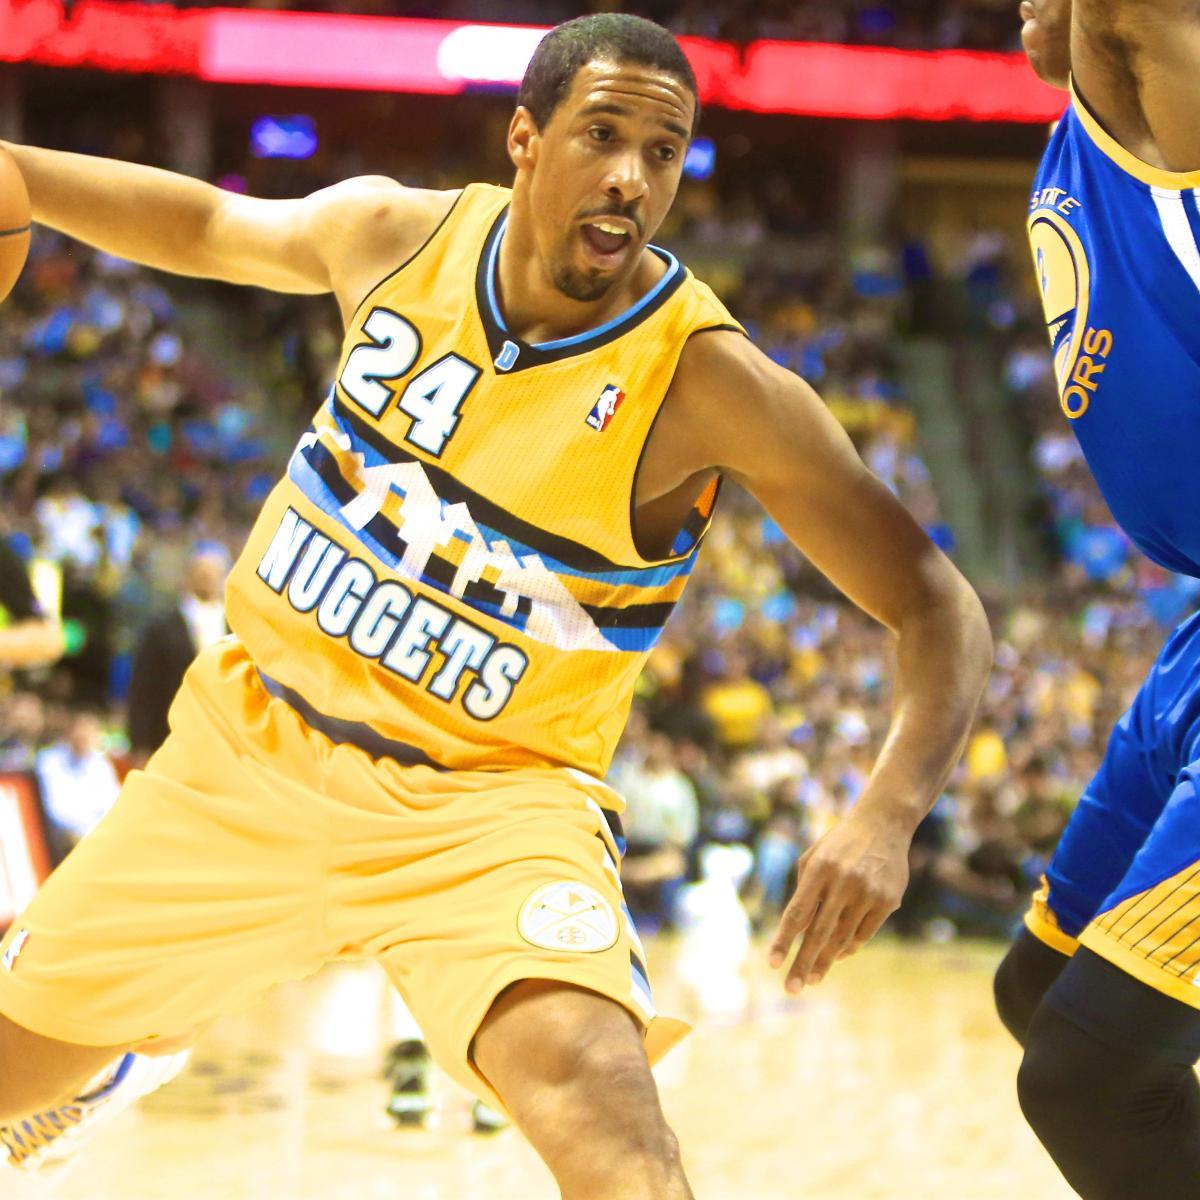 Nuggets Quarter Season Tickets: Golden State Warriors Vs. Denver Nuggets: Game 1 Score